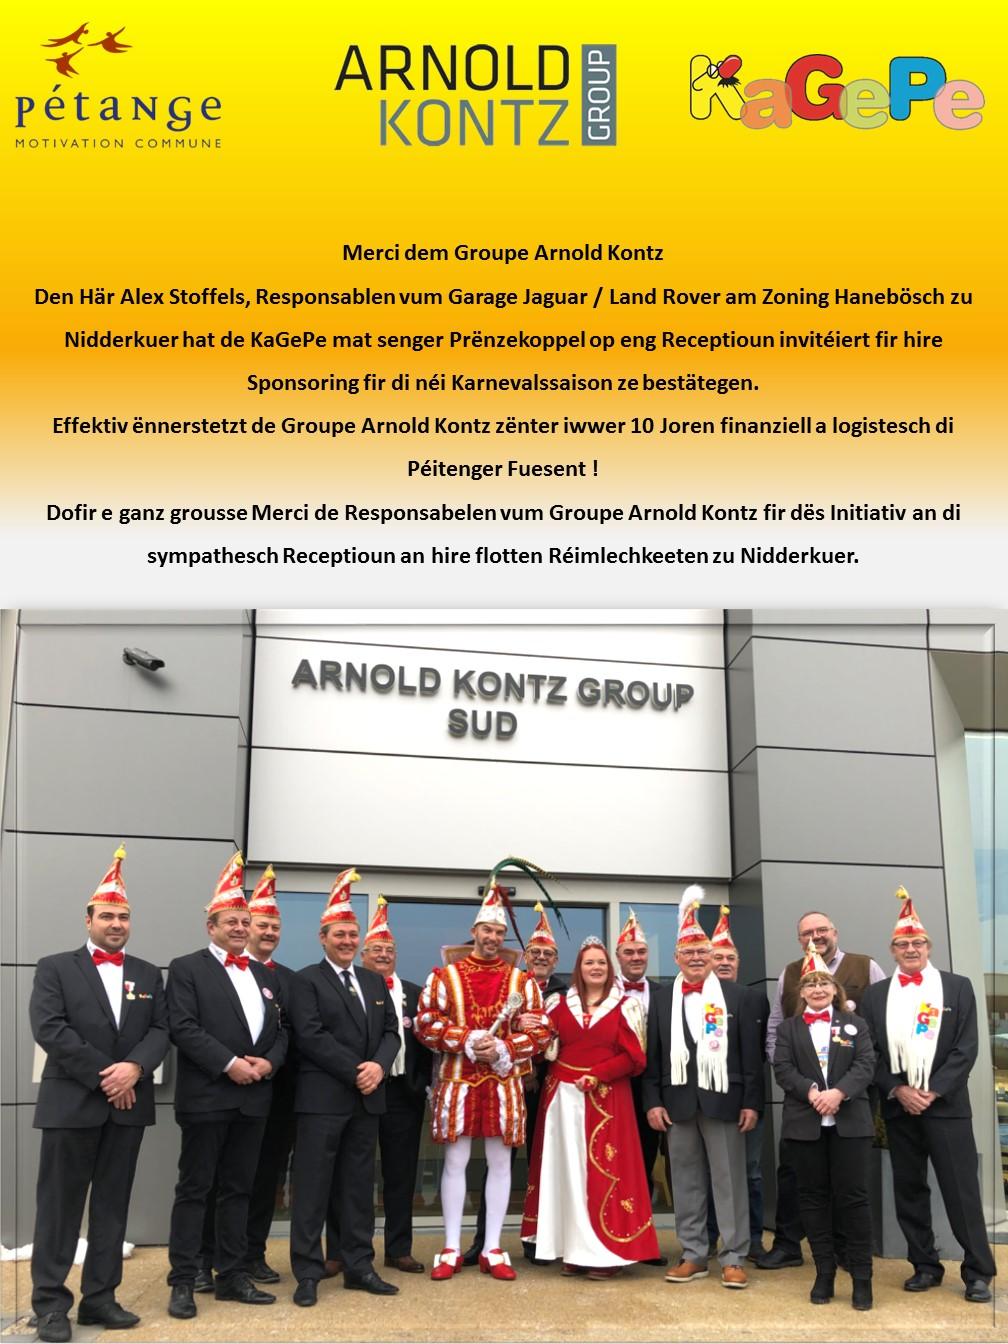 Merci dem Groupe Arnold Kontz